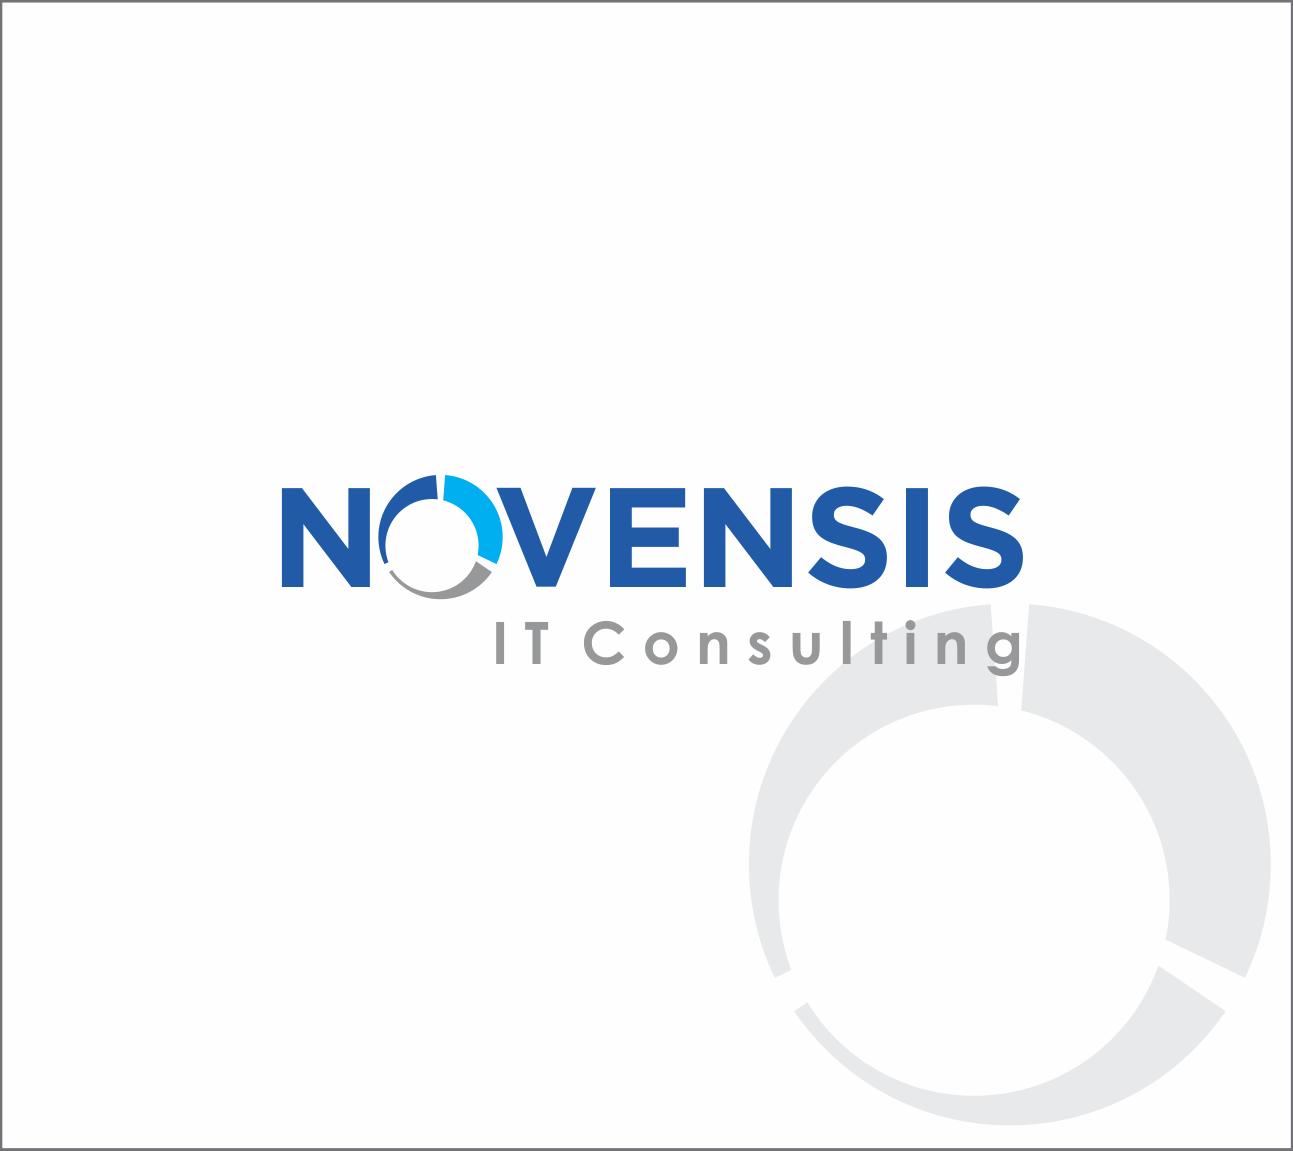 Logo Design by Armada Jamaluddin - Entry No. 184 in the Logo Design Contest Novensis Logo Design.